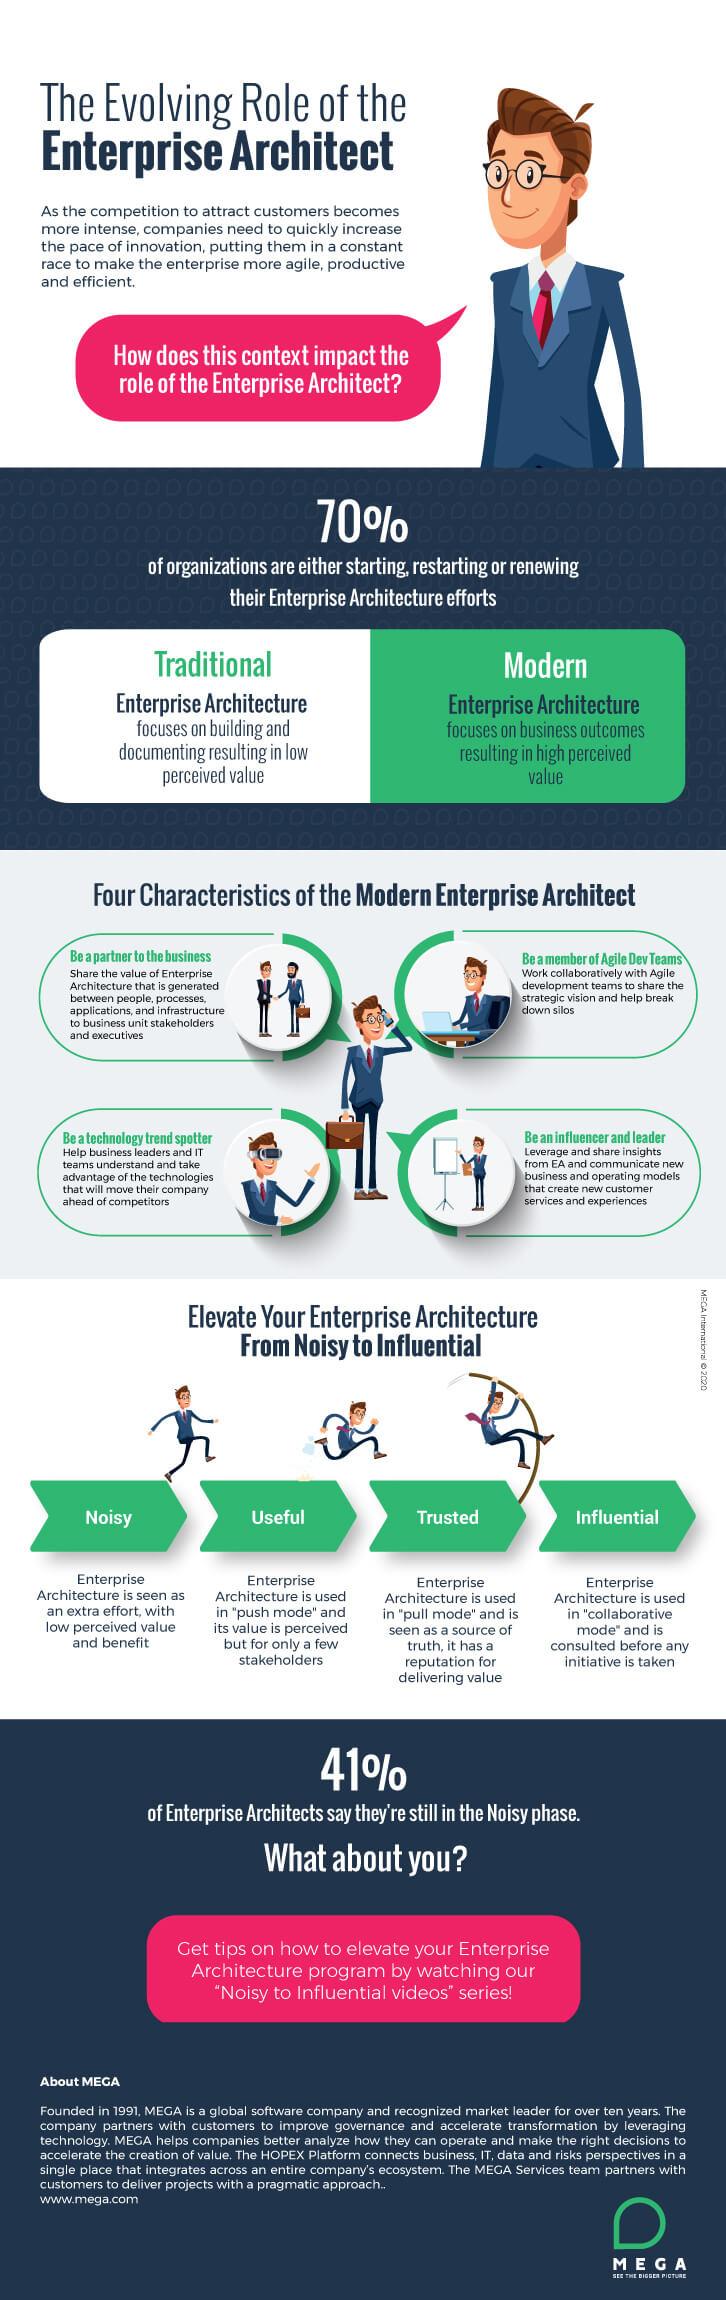 The Evolving Role of Enterprise Architect